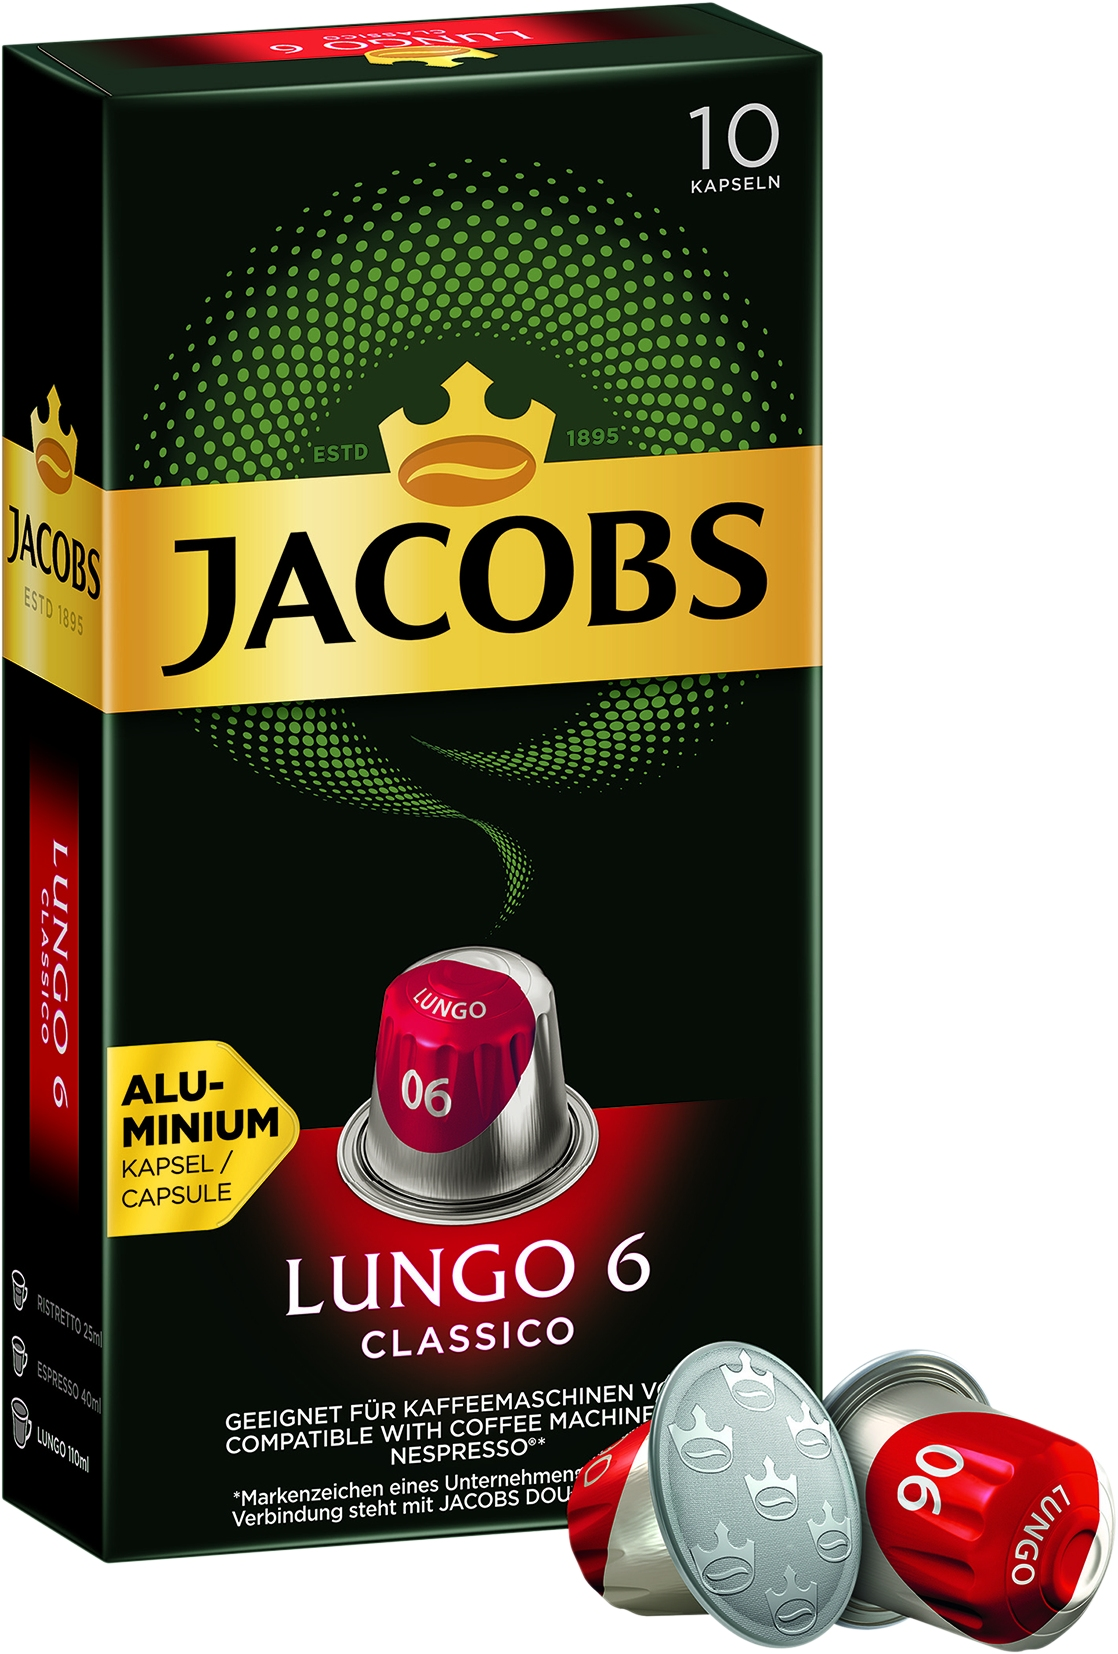 Lungo Classico 6 (Nespresso) 10 St.